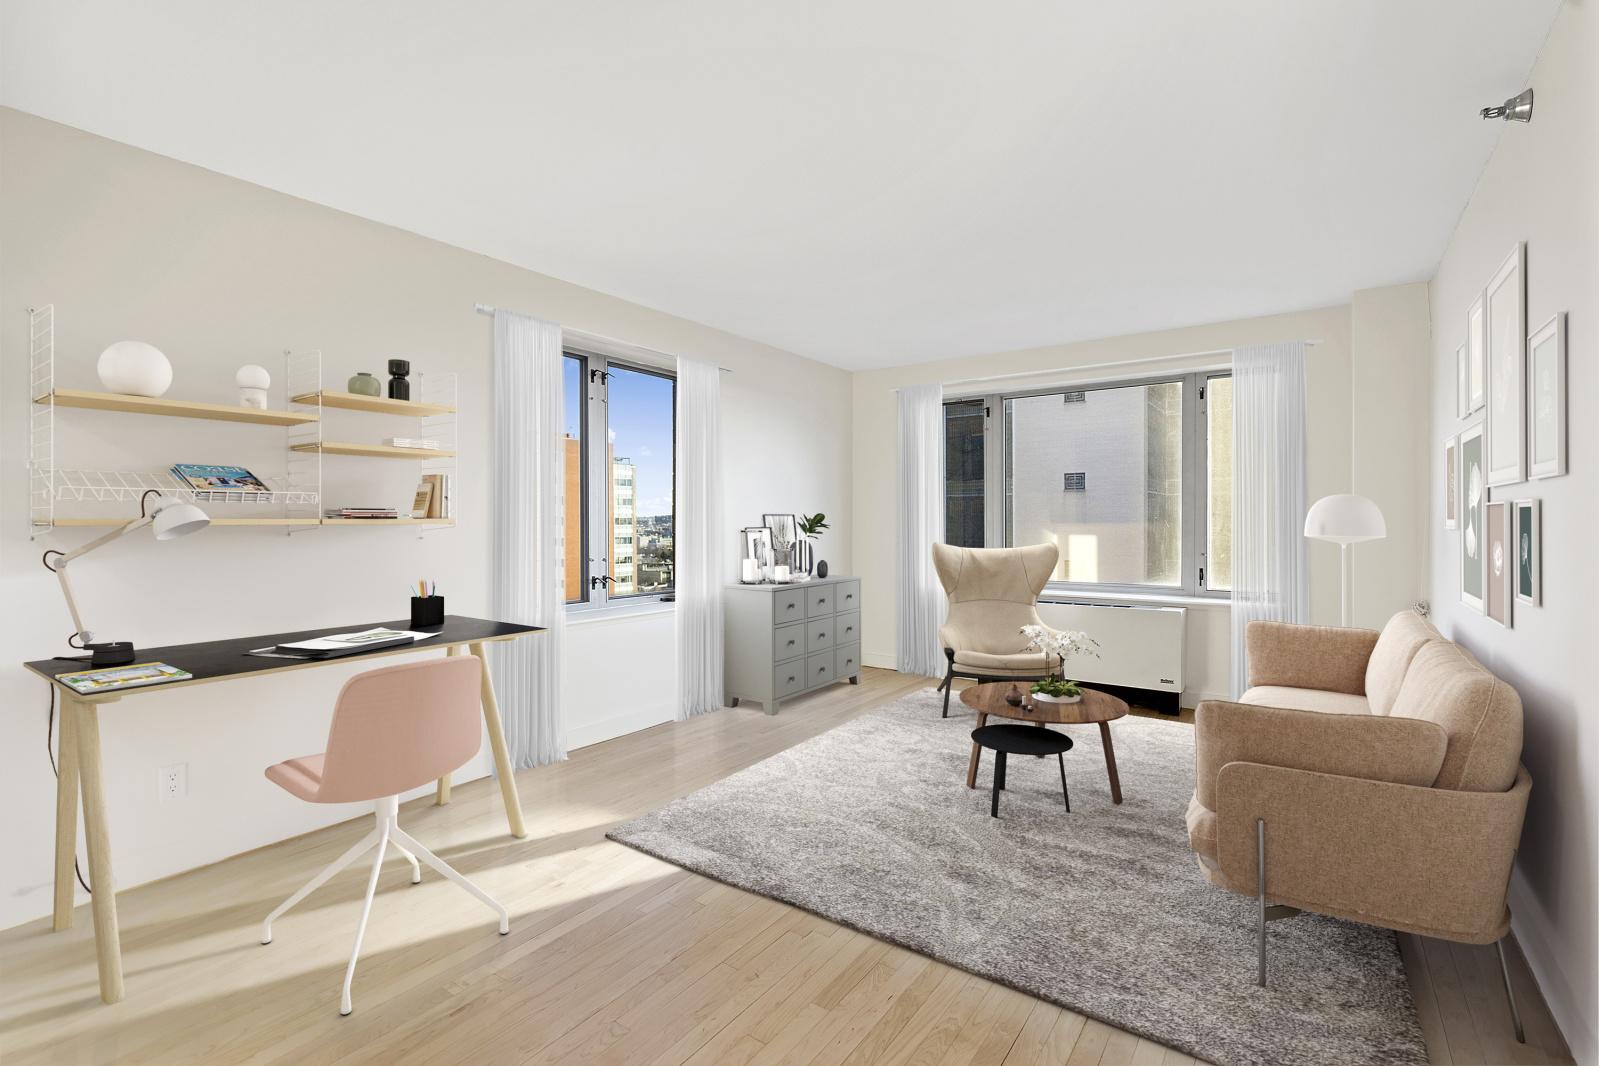 Apartment for sale at 53 Boerum Place, Apt 11-C